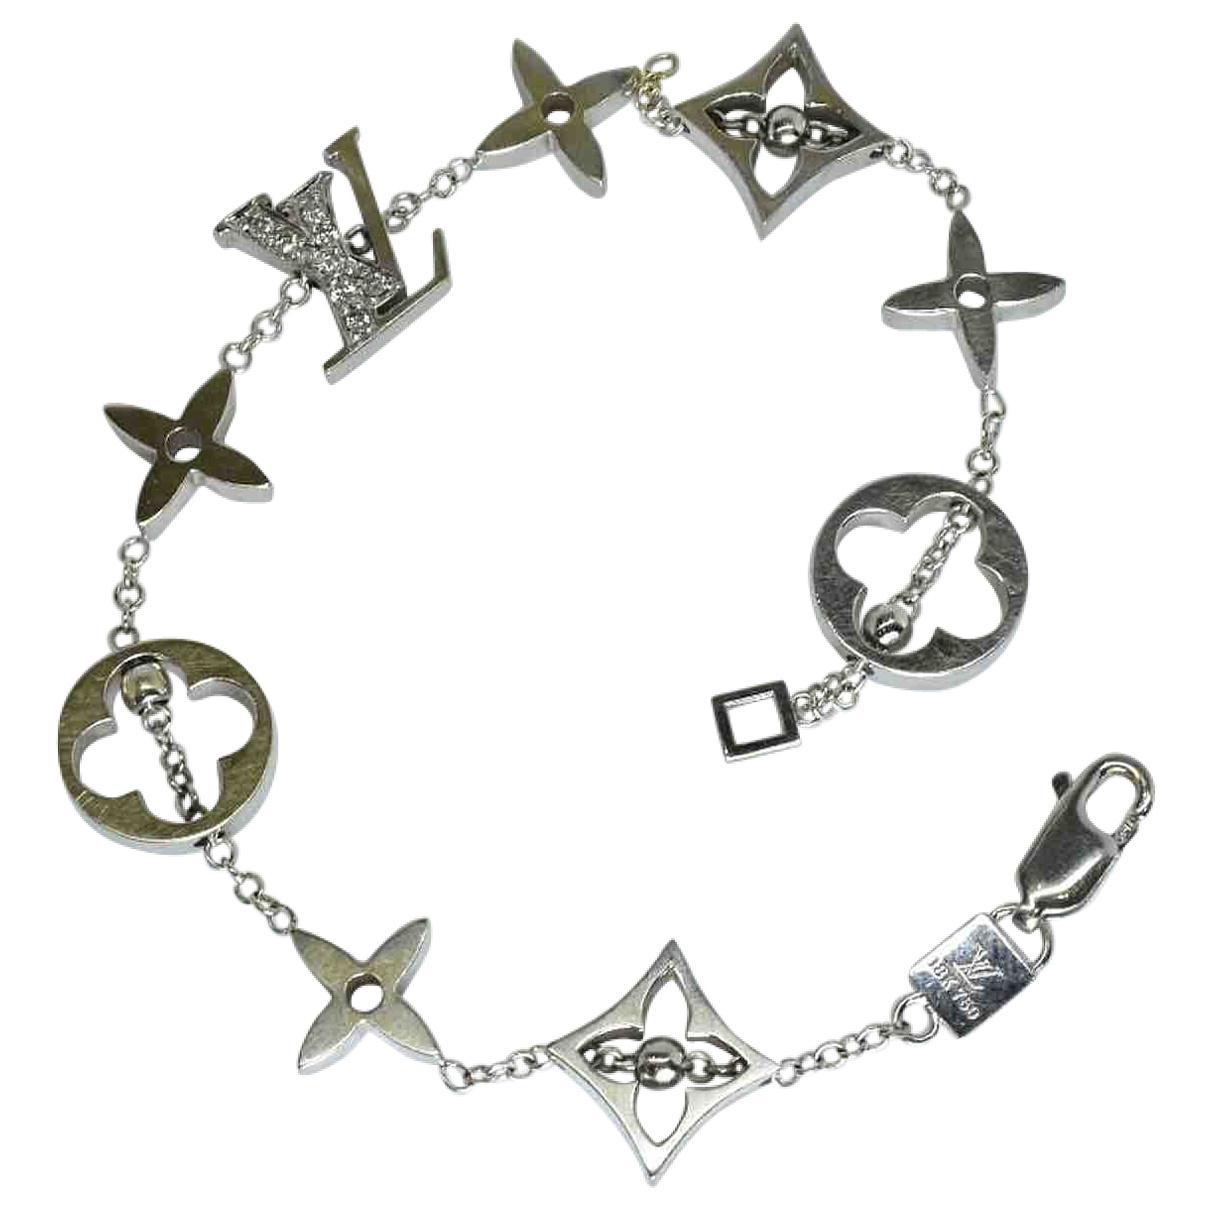 6b392e80f410 Louis Vuitton. Women s Metallic Idylle Blossom Silver White Gold Bracelets